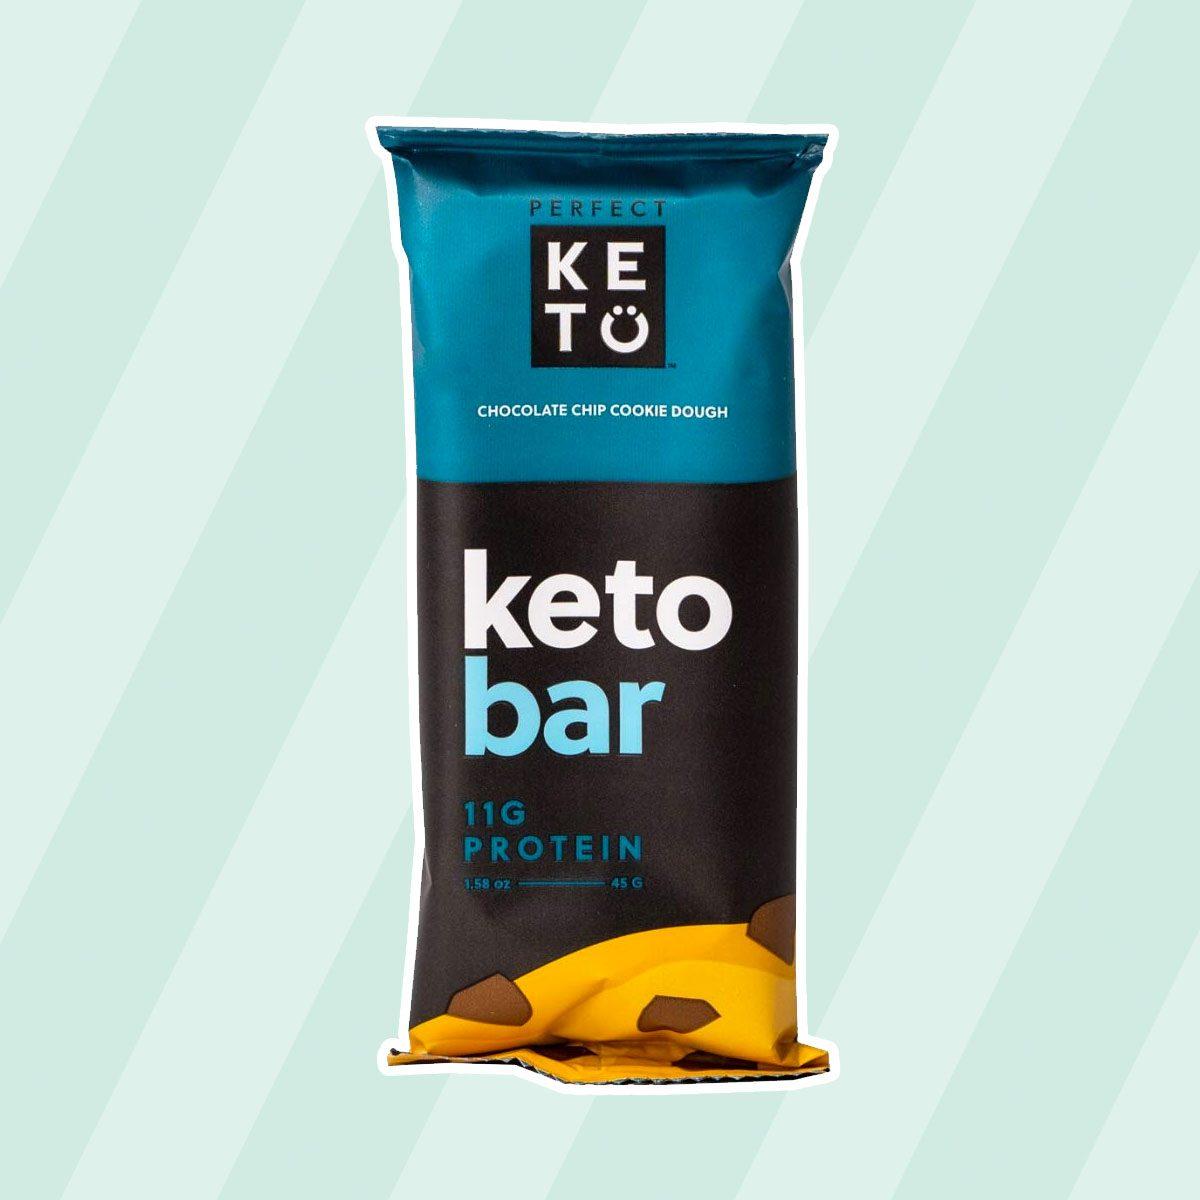 Perfect Keto Bars keto snack bars